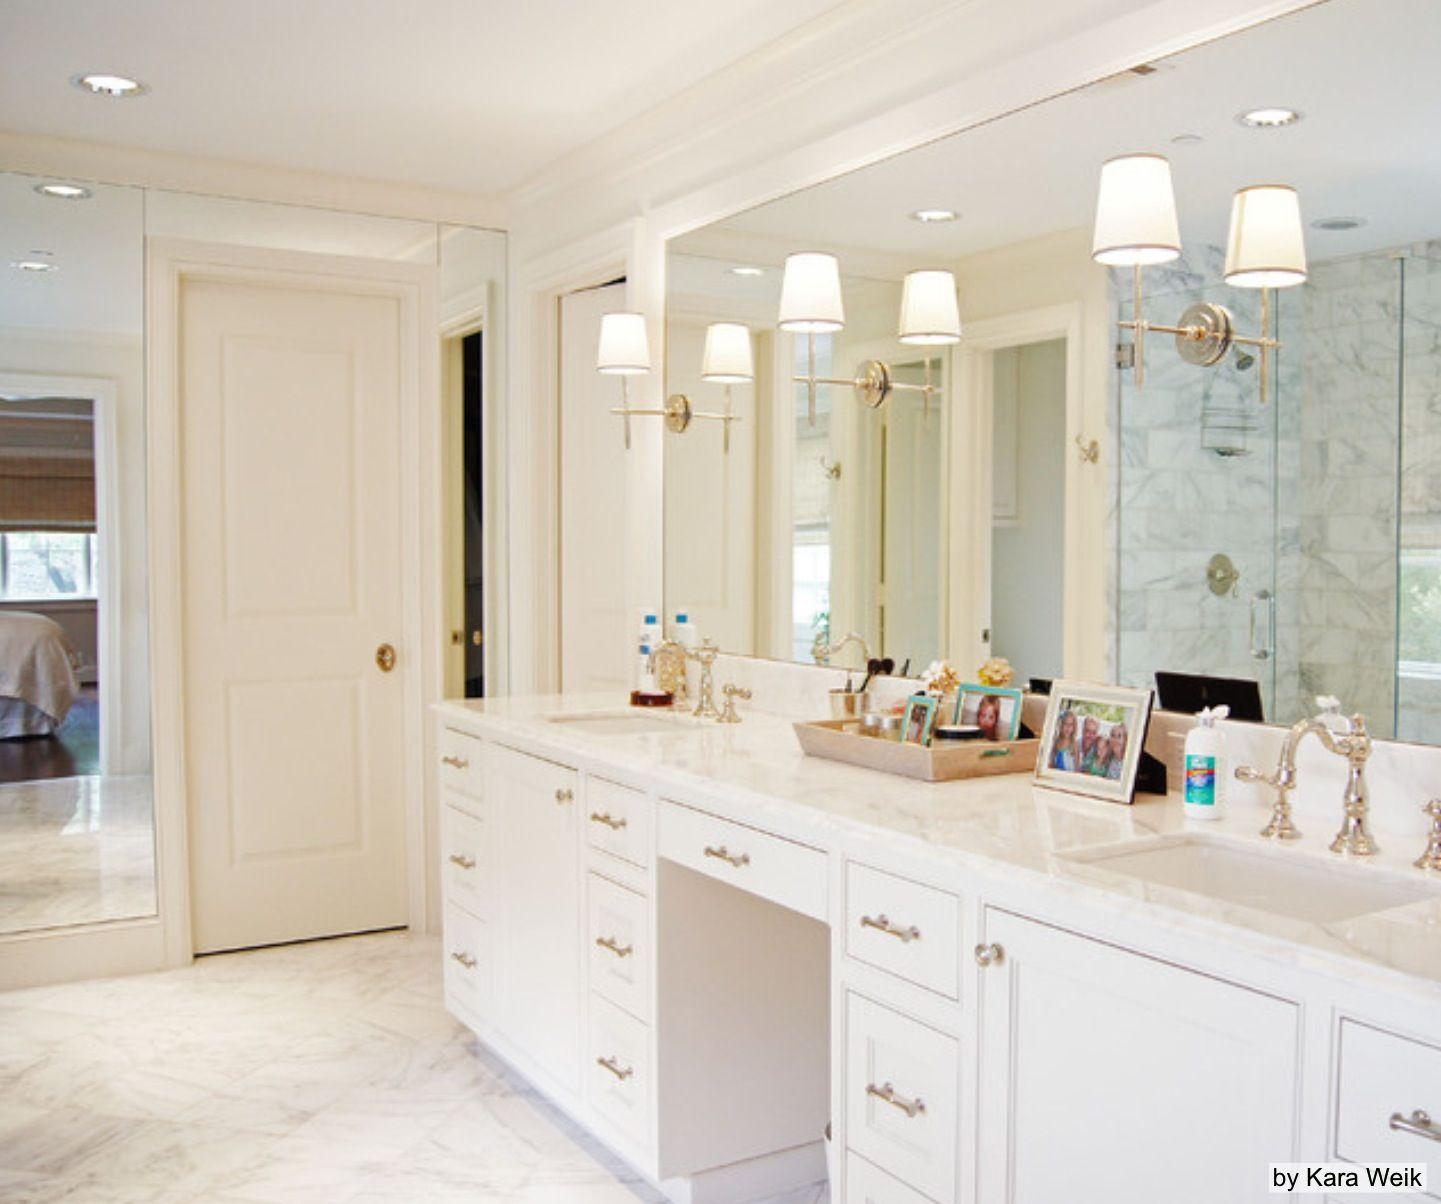 Master bath layout - love the full length mirror | Bathrooms ...